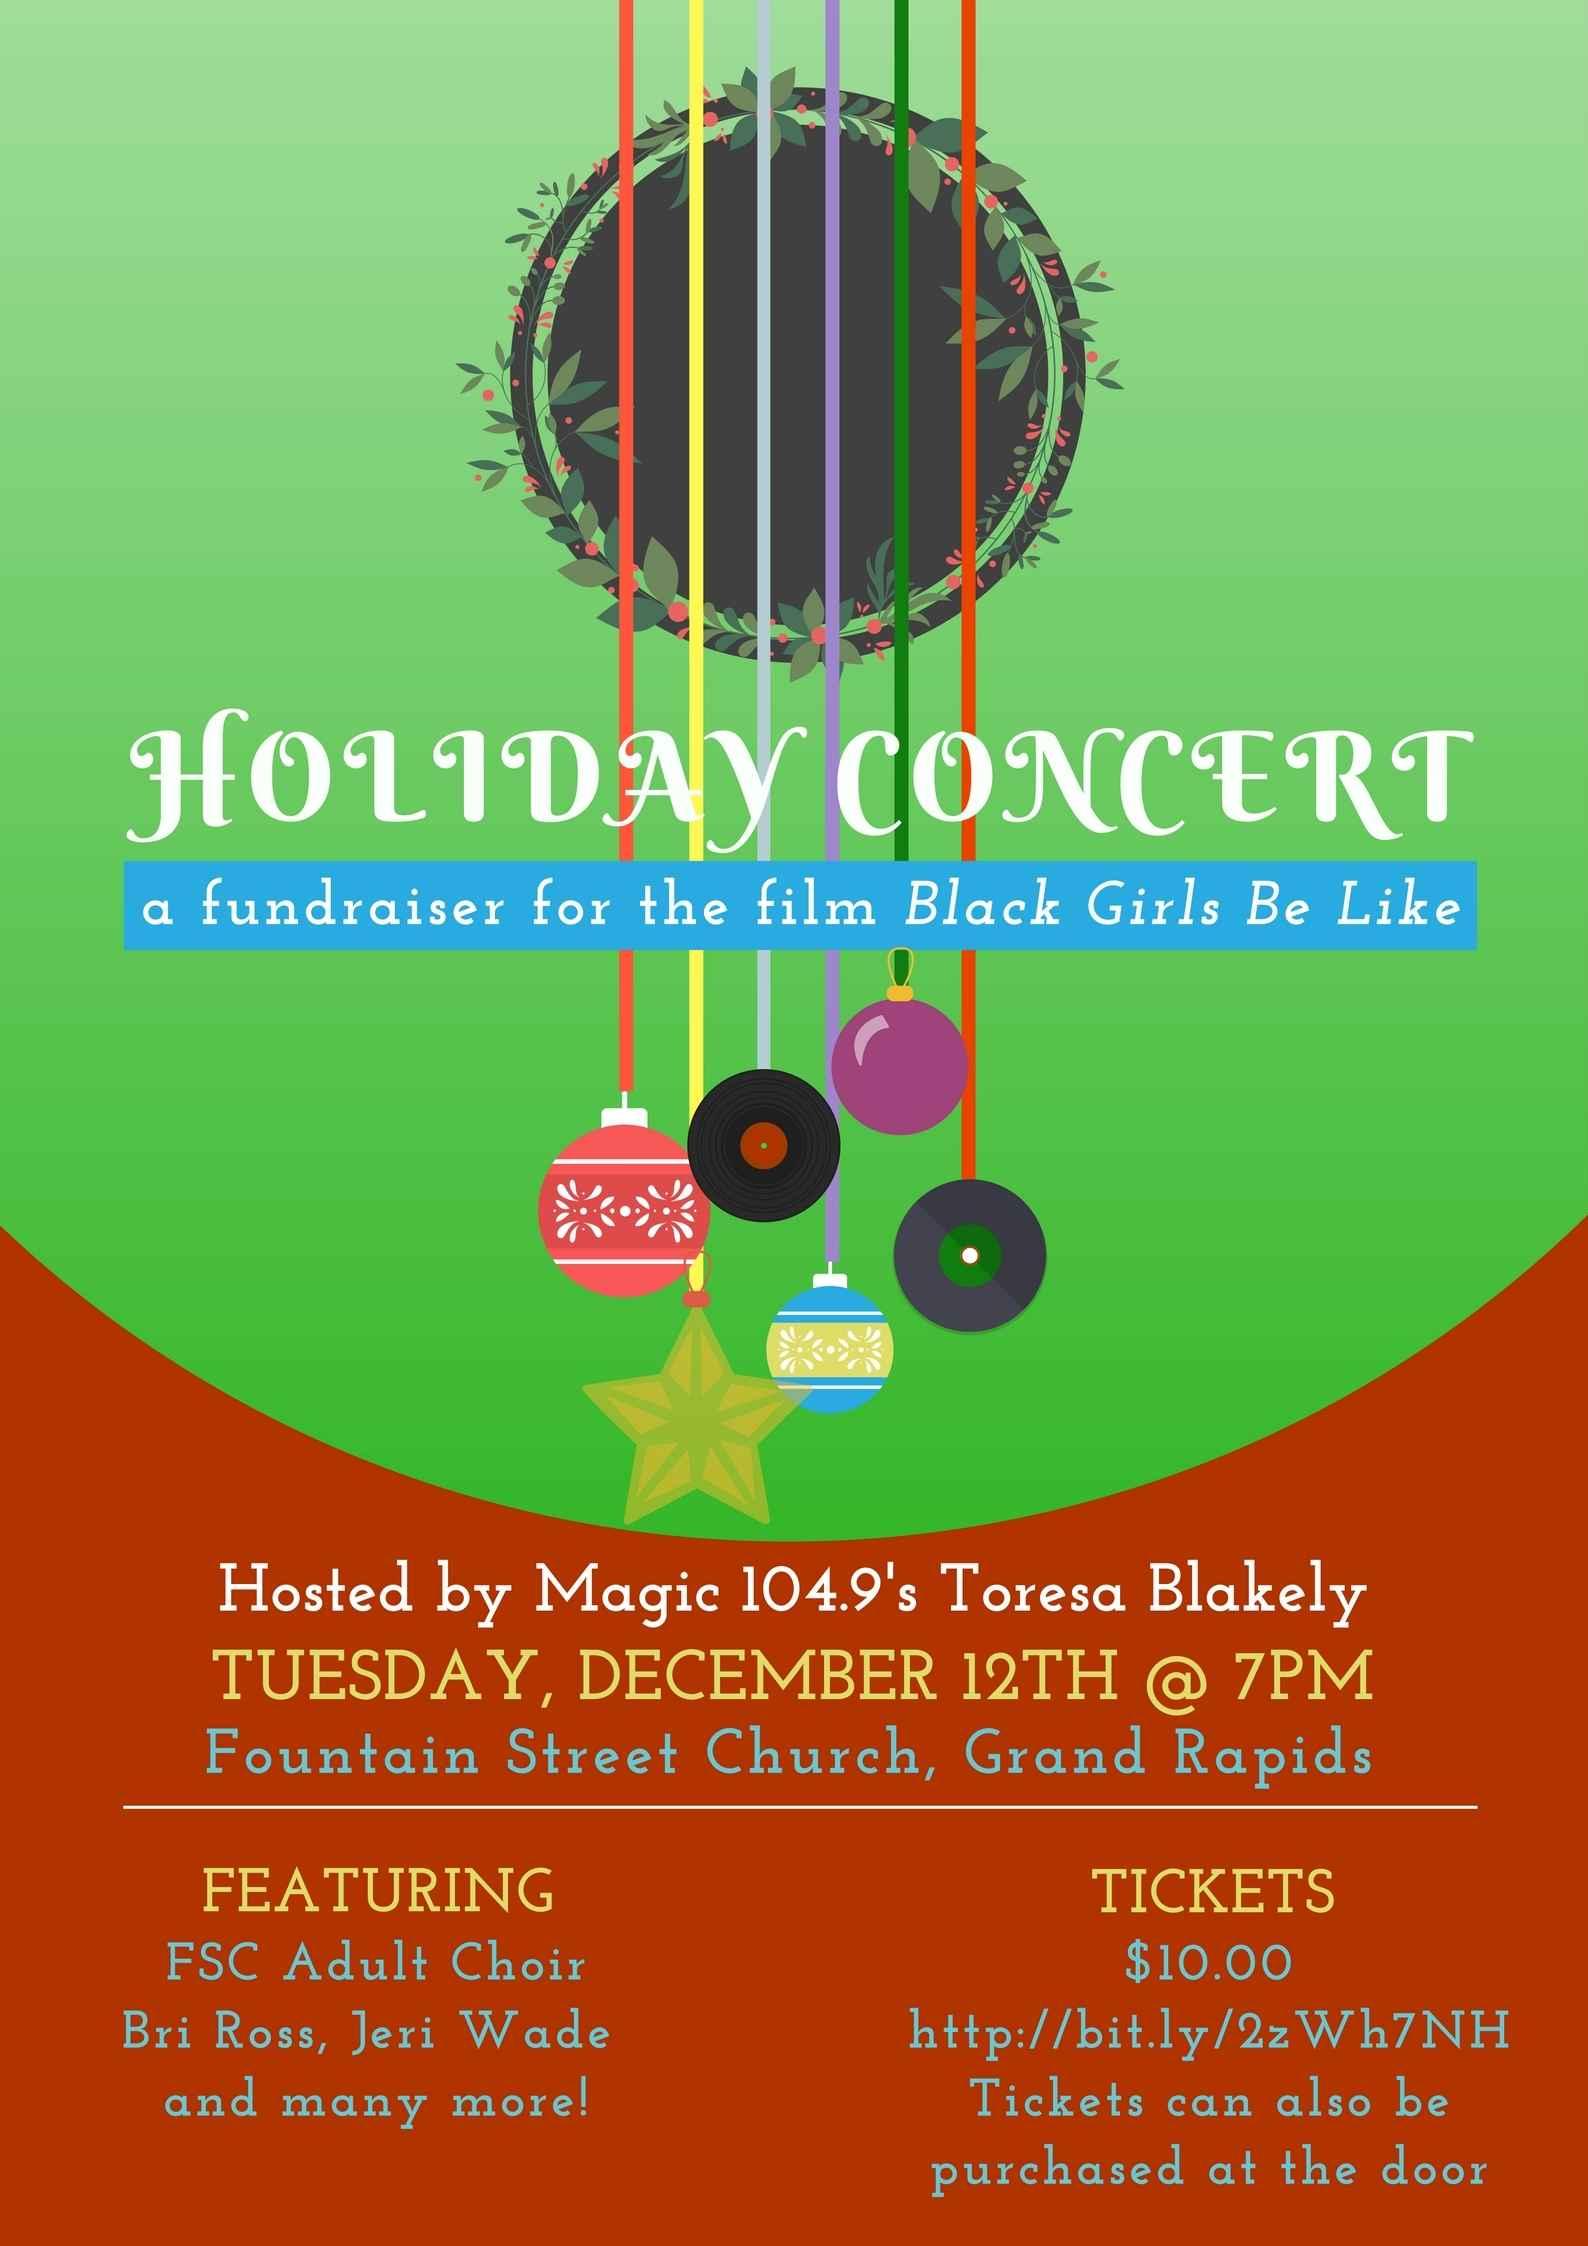 """Black Girls Be Like"" Holiday Concert Fundraiser image"